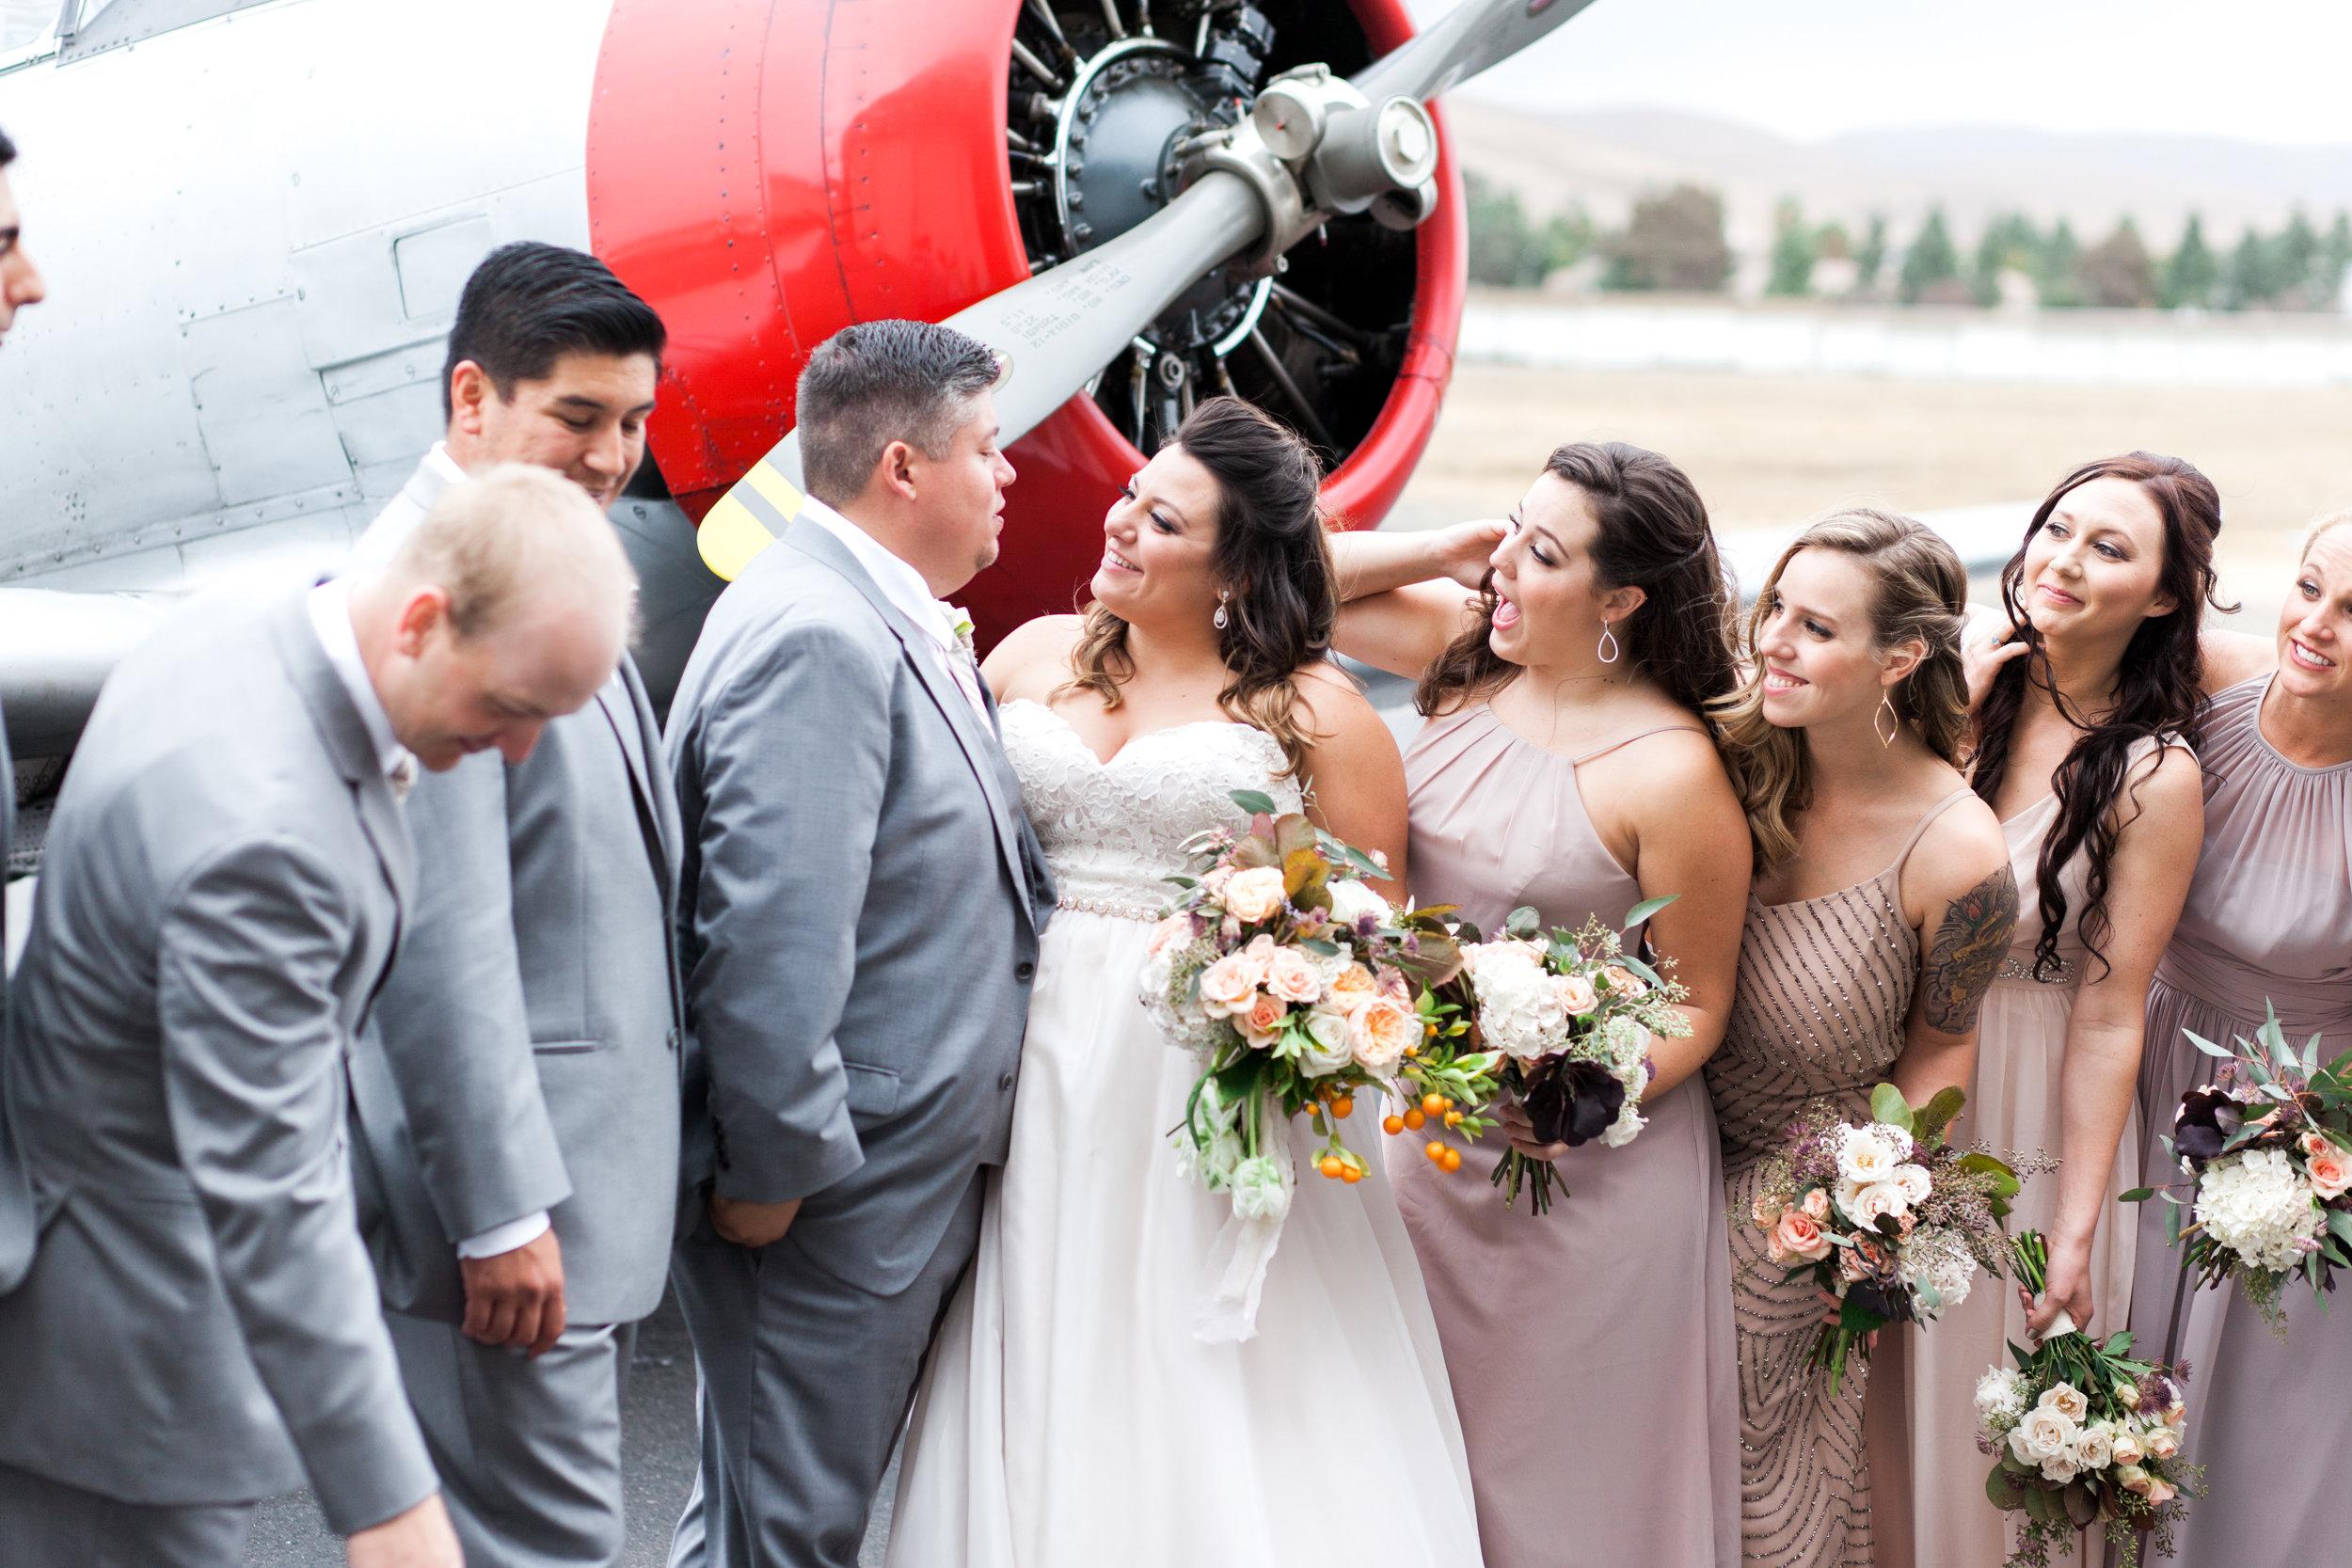 airport-hanger-wedding-at-attitude-aviation-in-livermore-70.jpg